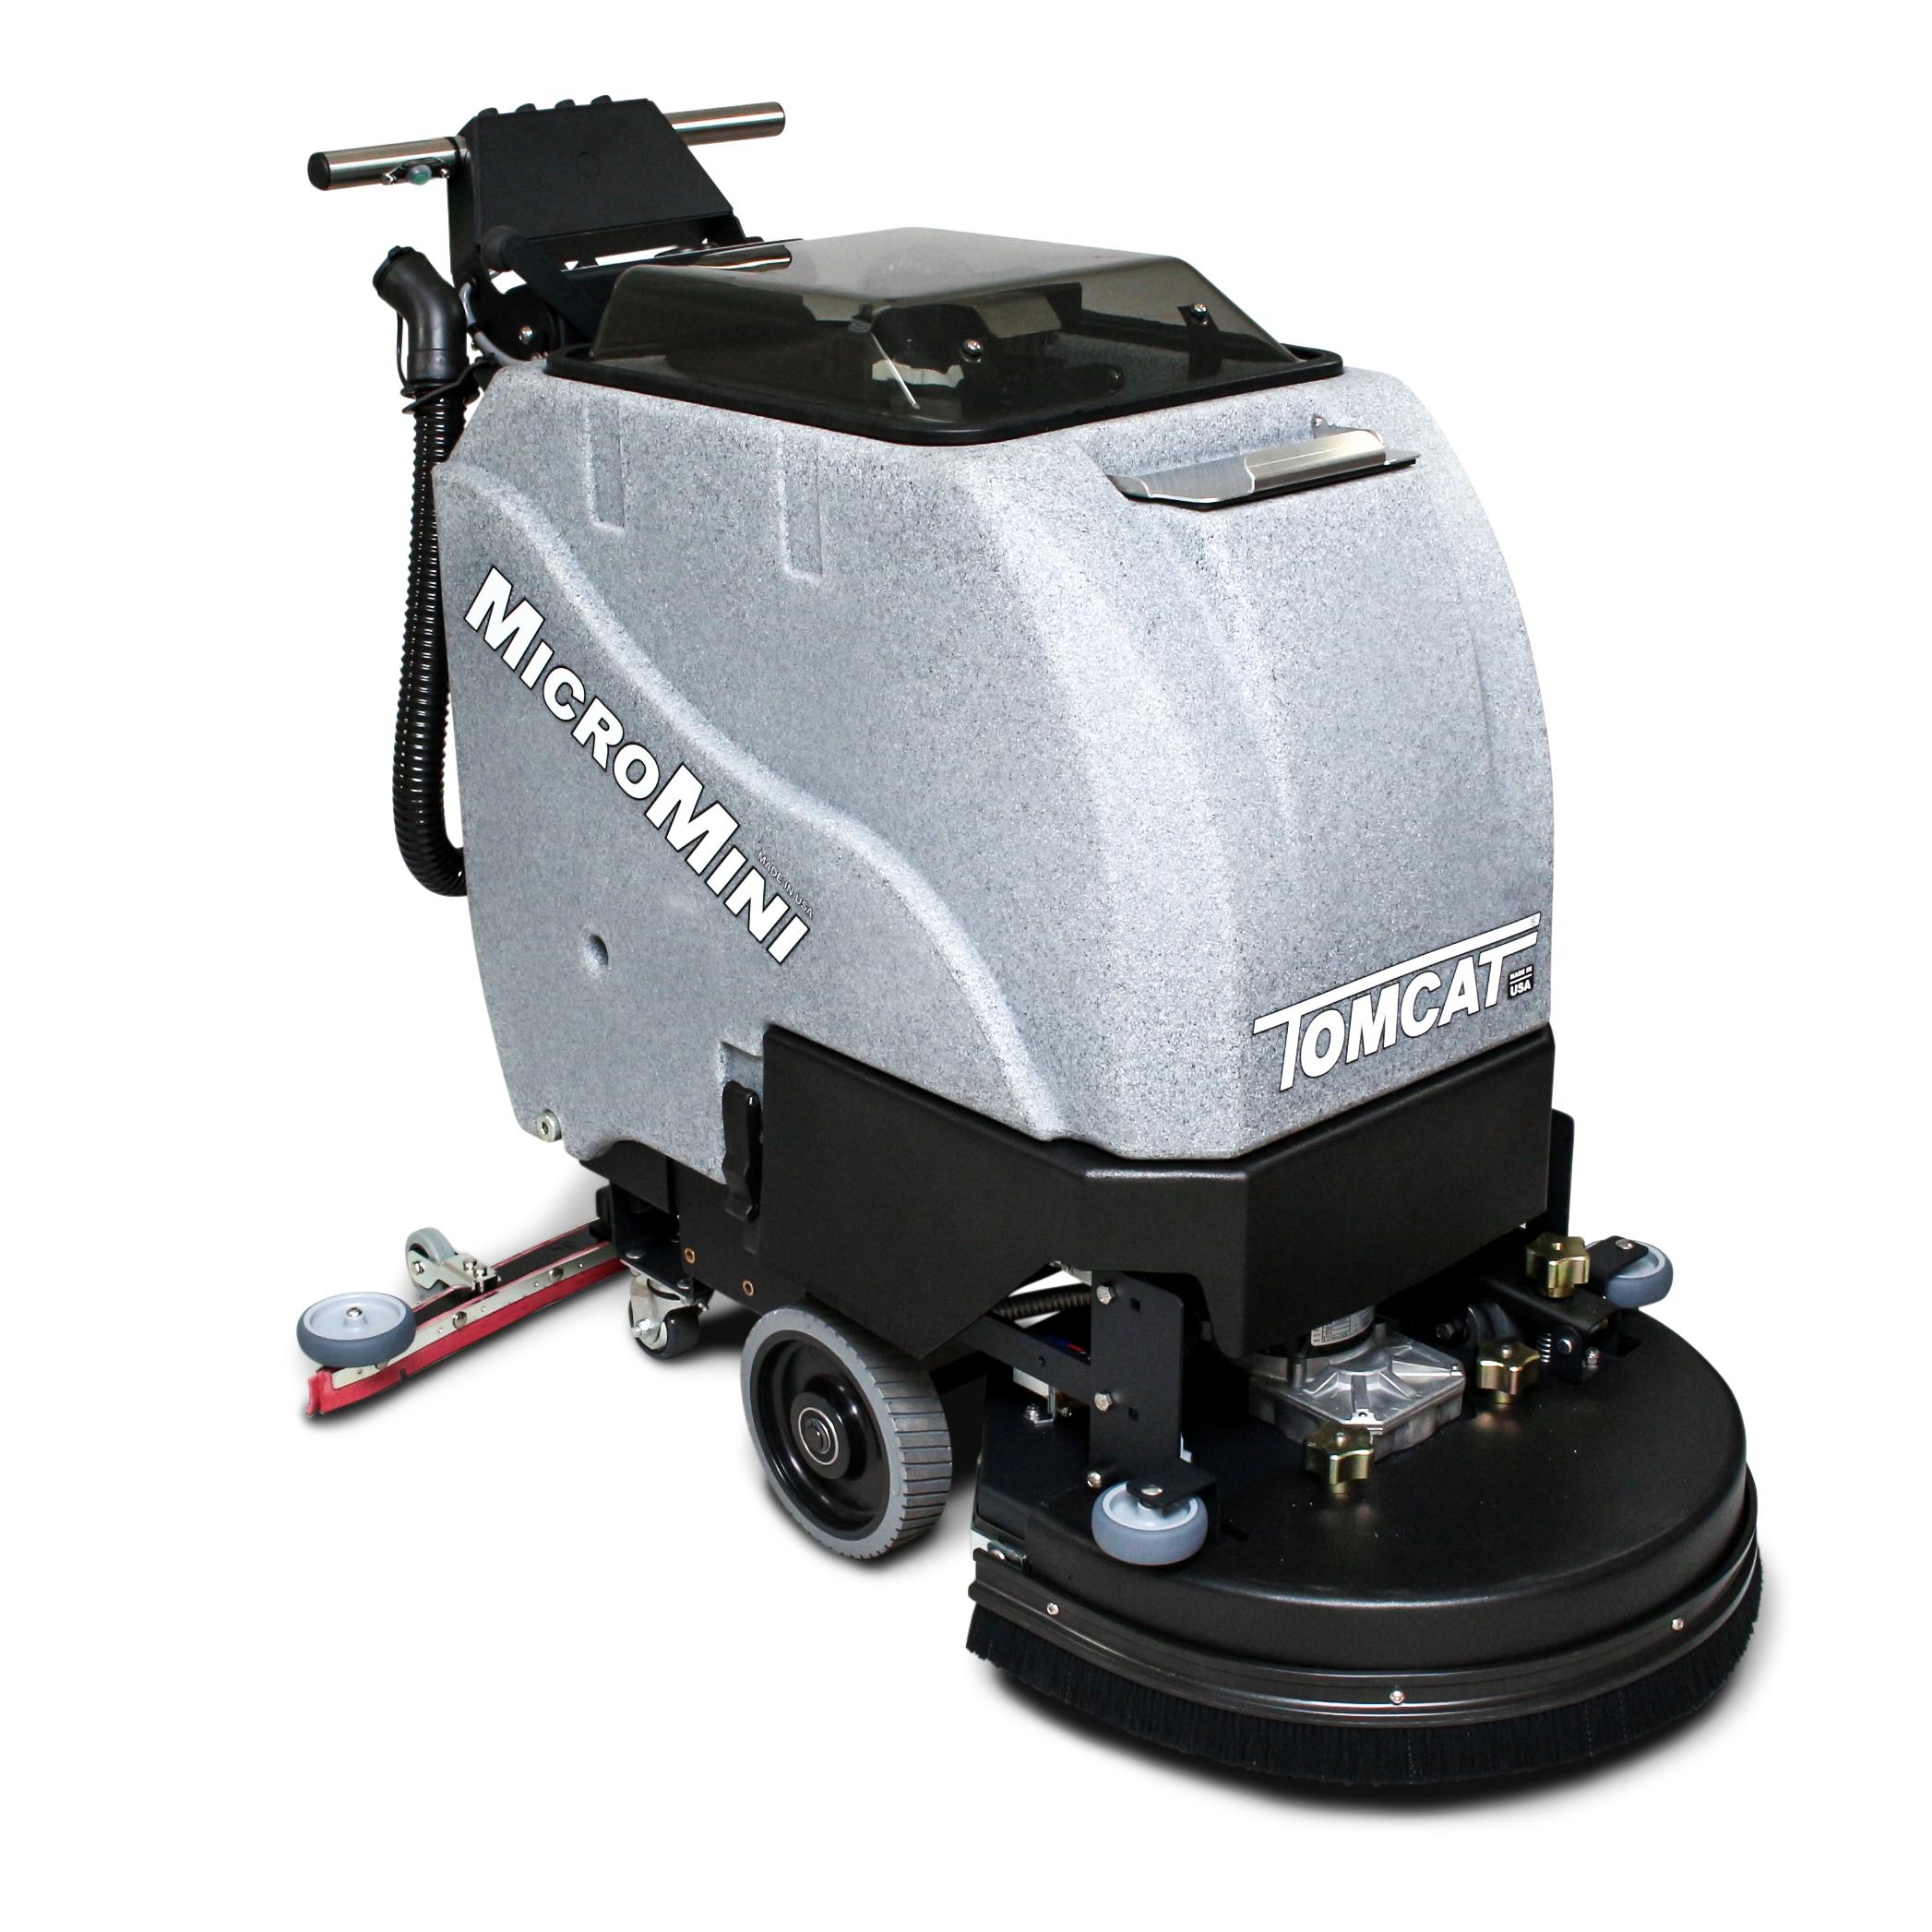 Tomcat Micromini Walk Behind Floor Scrubber Dryer System